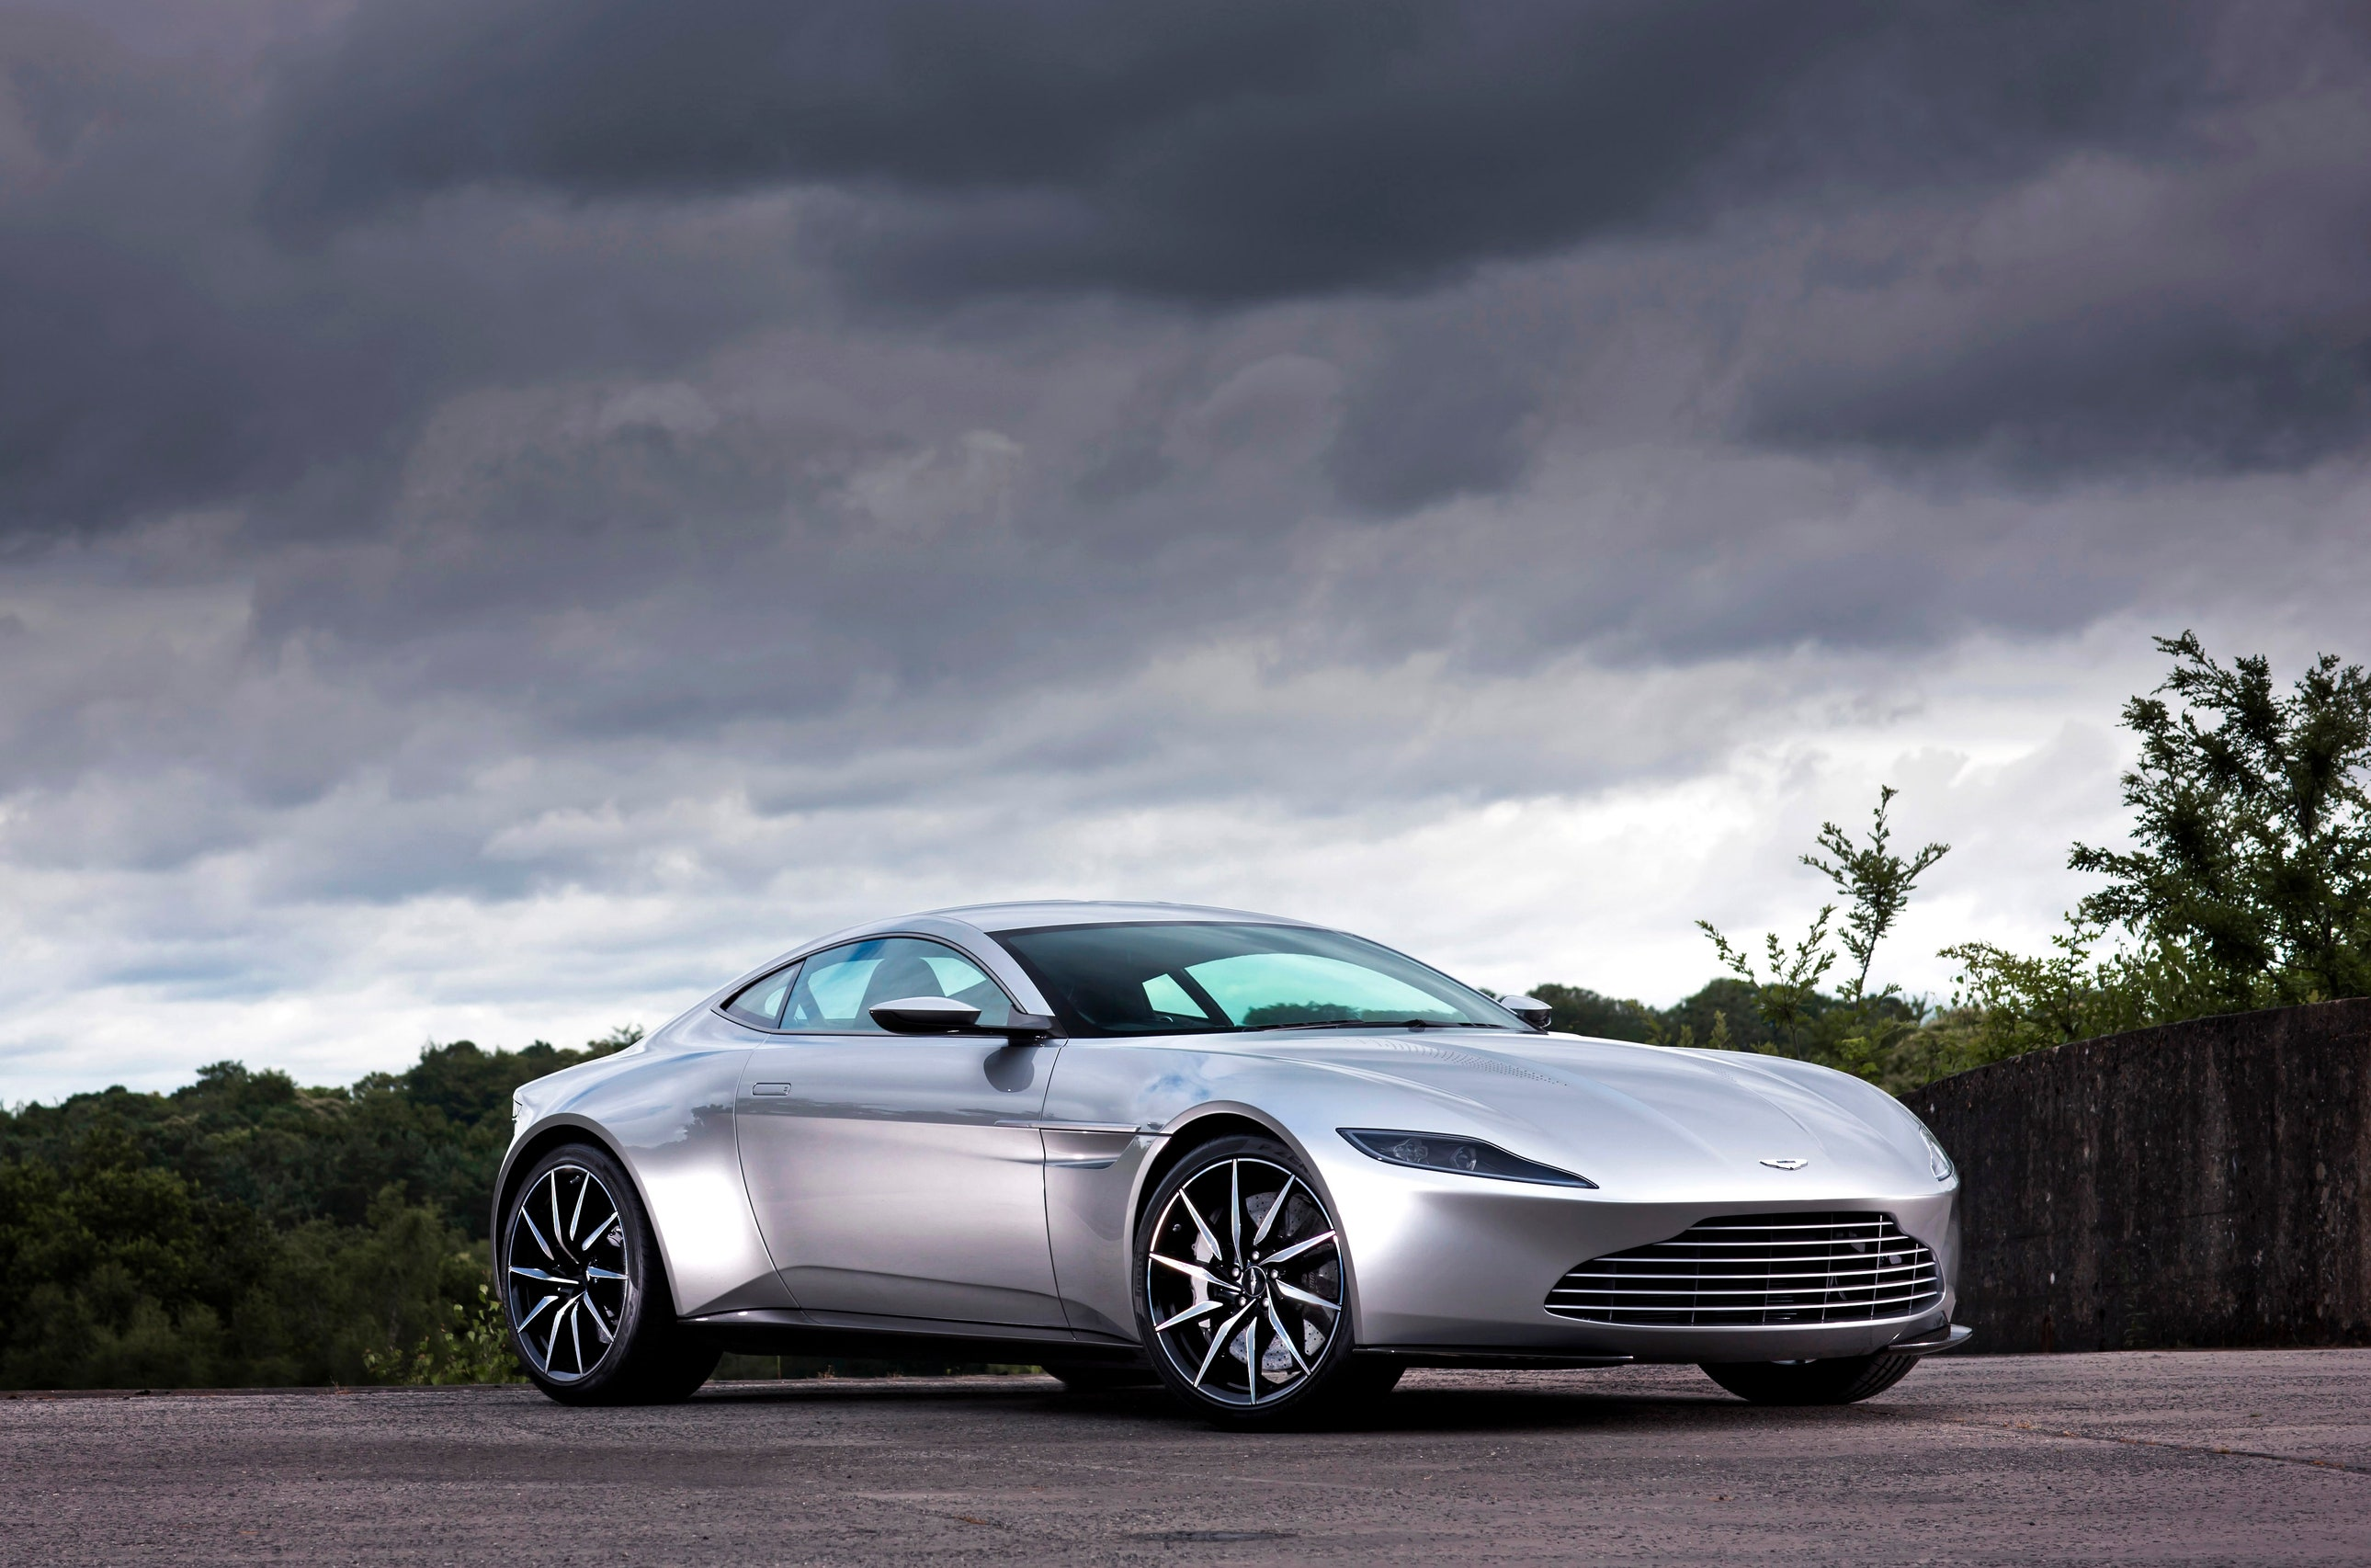 Aston Martin DB10, solo 10 unidades para todo el mundo